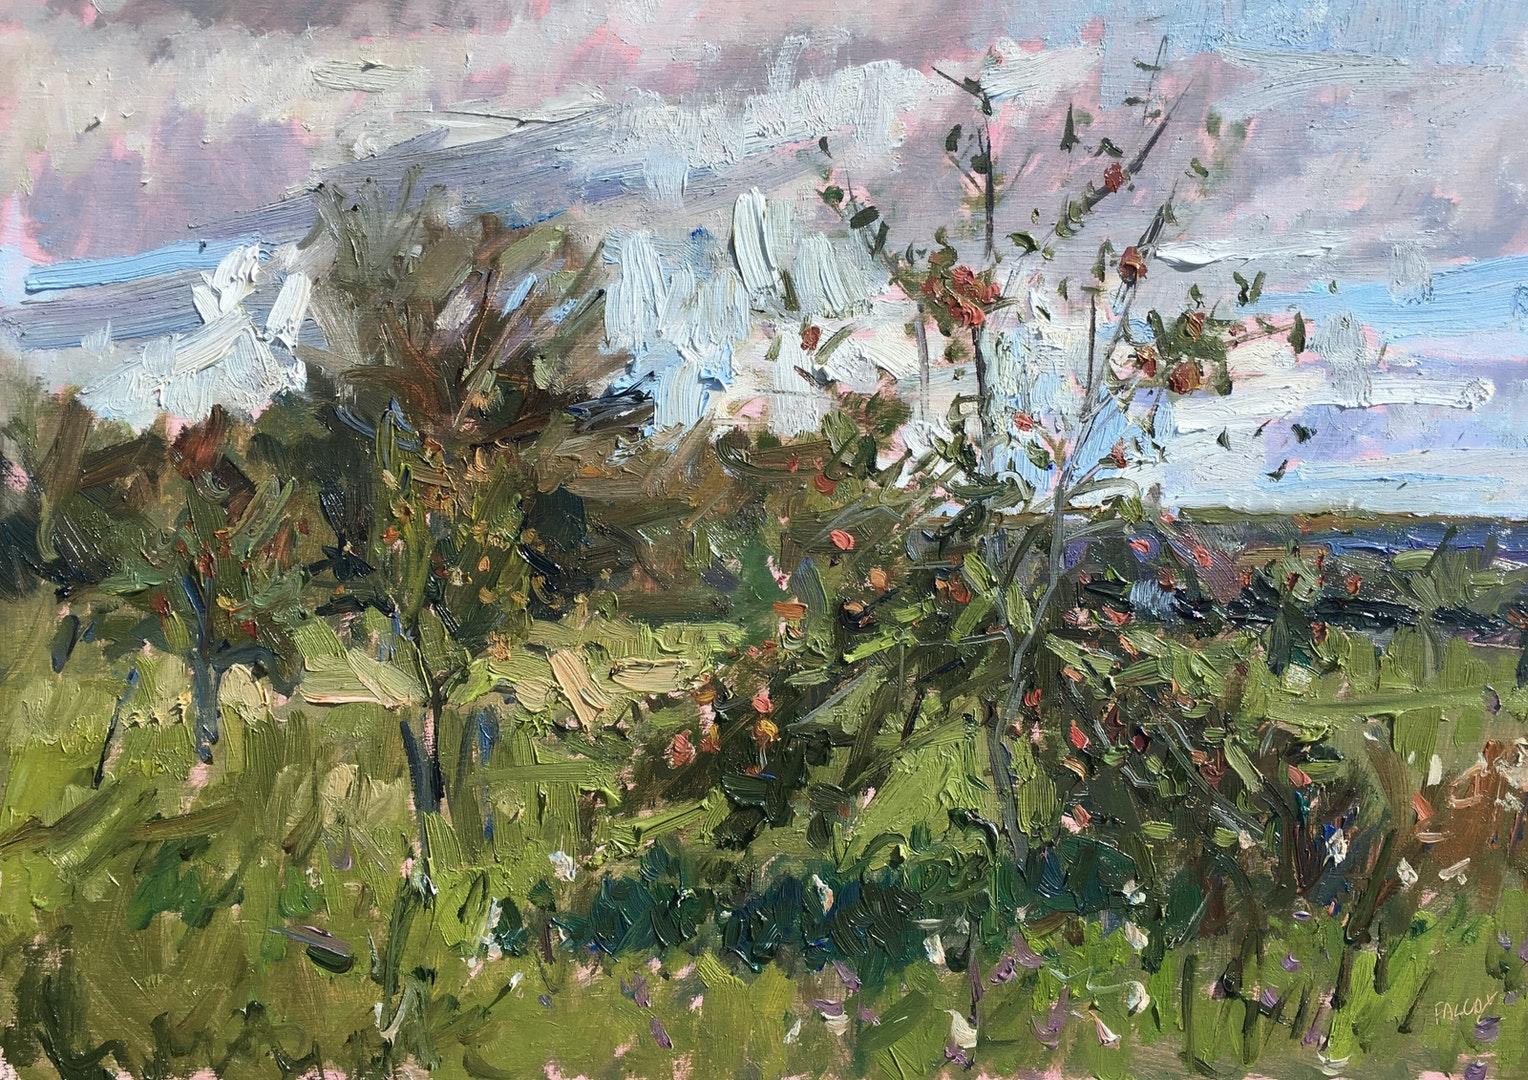 'Arundel orchard, late Summer', Emily Faludy, Oil on board, 30 x 45 cm